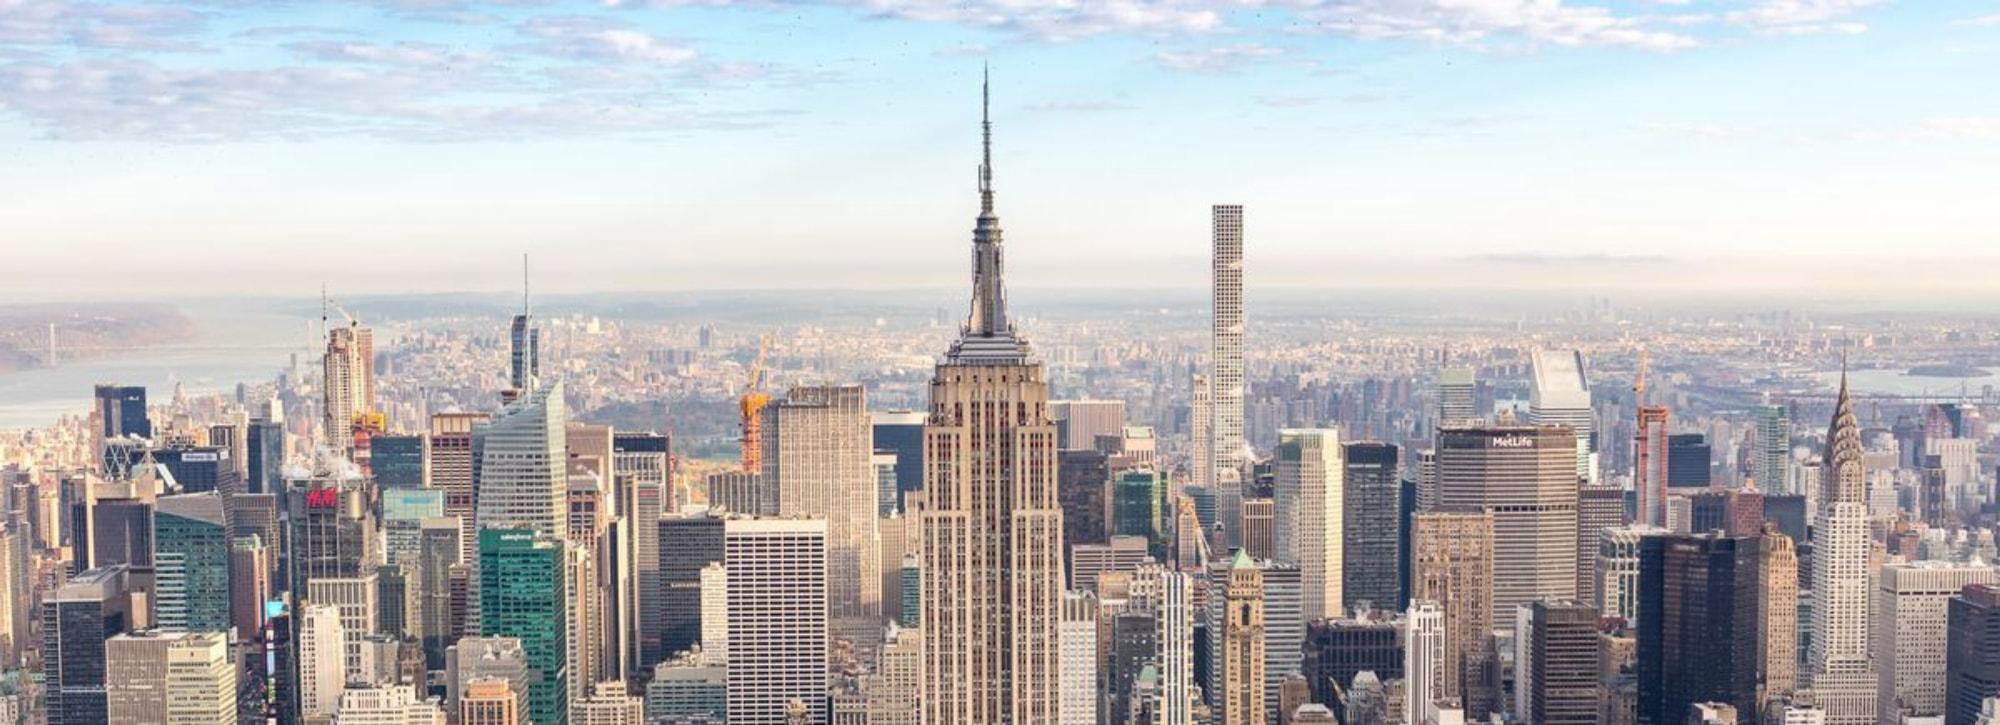 Getting to Manhattan, New York